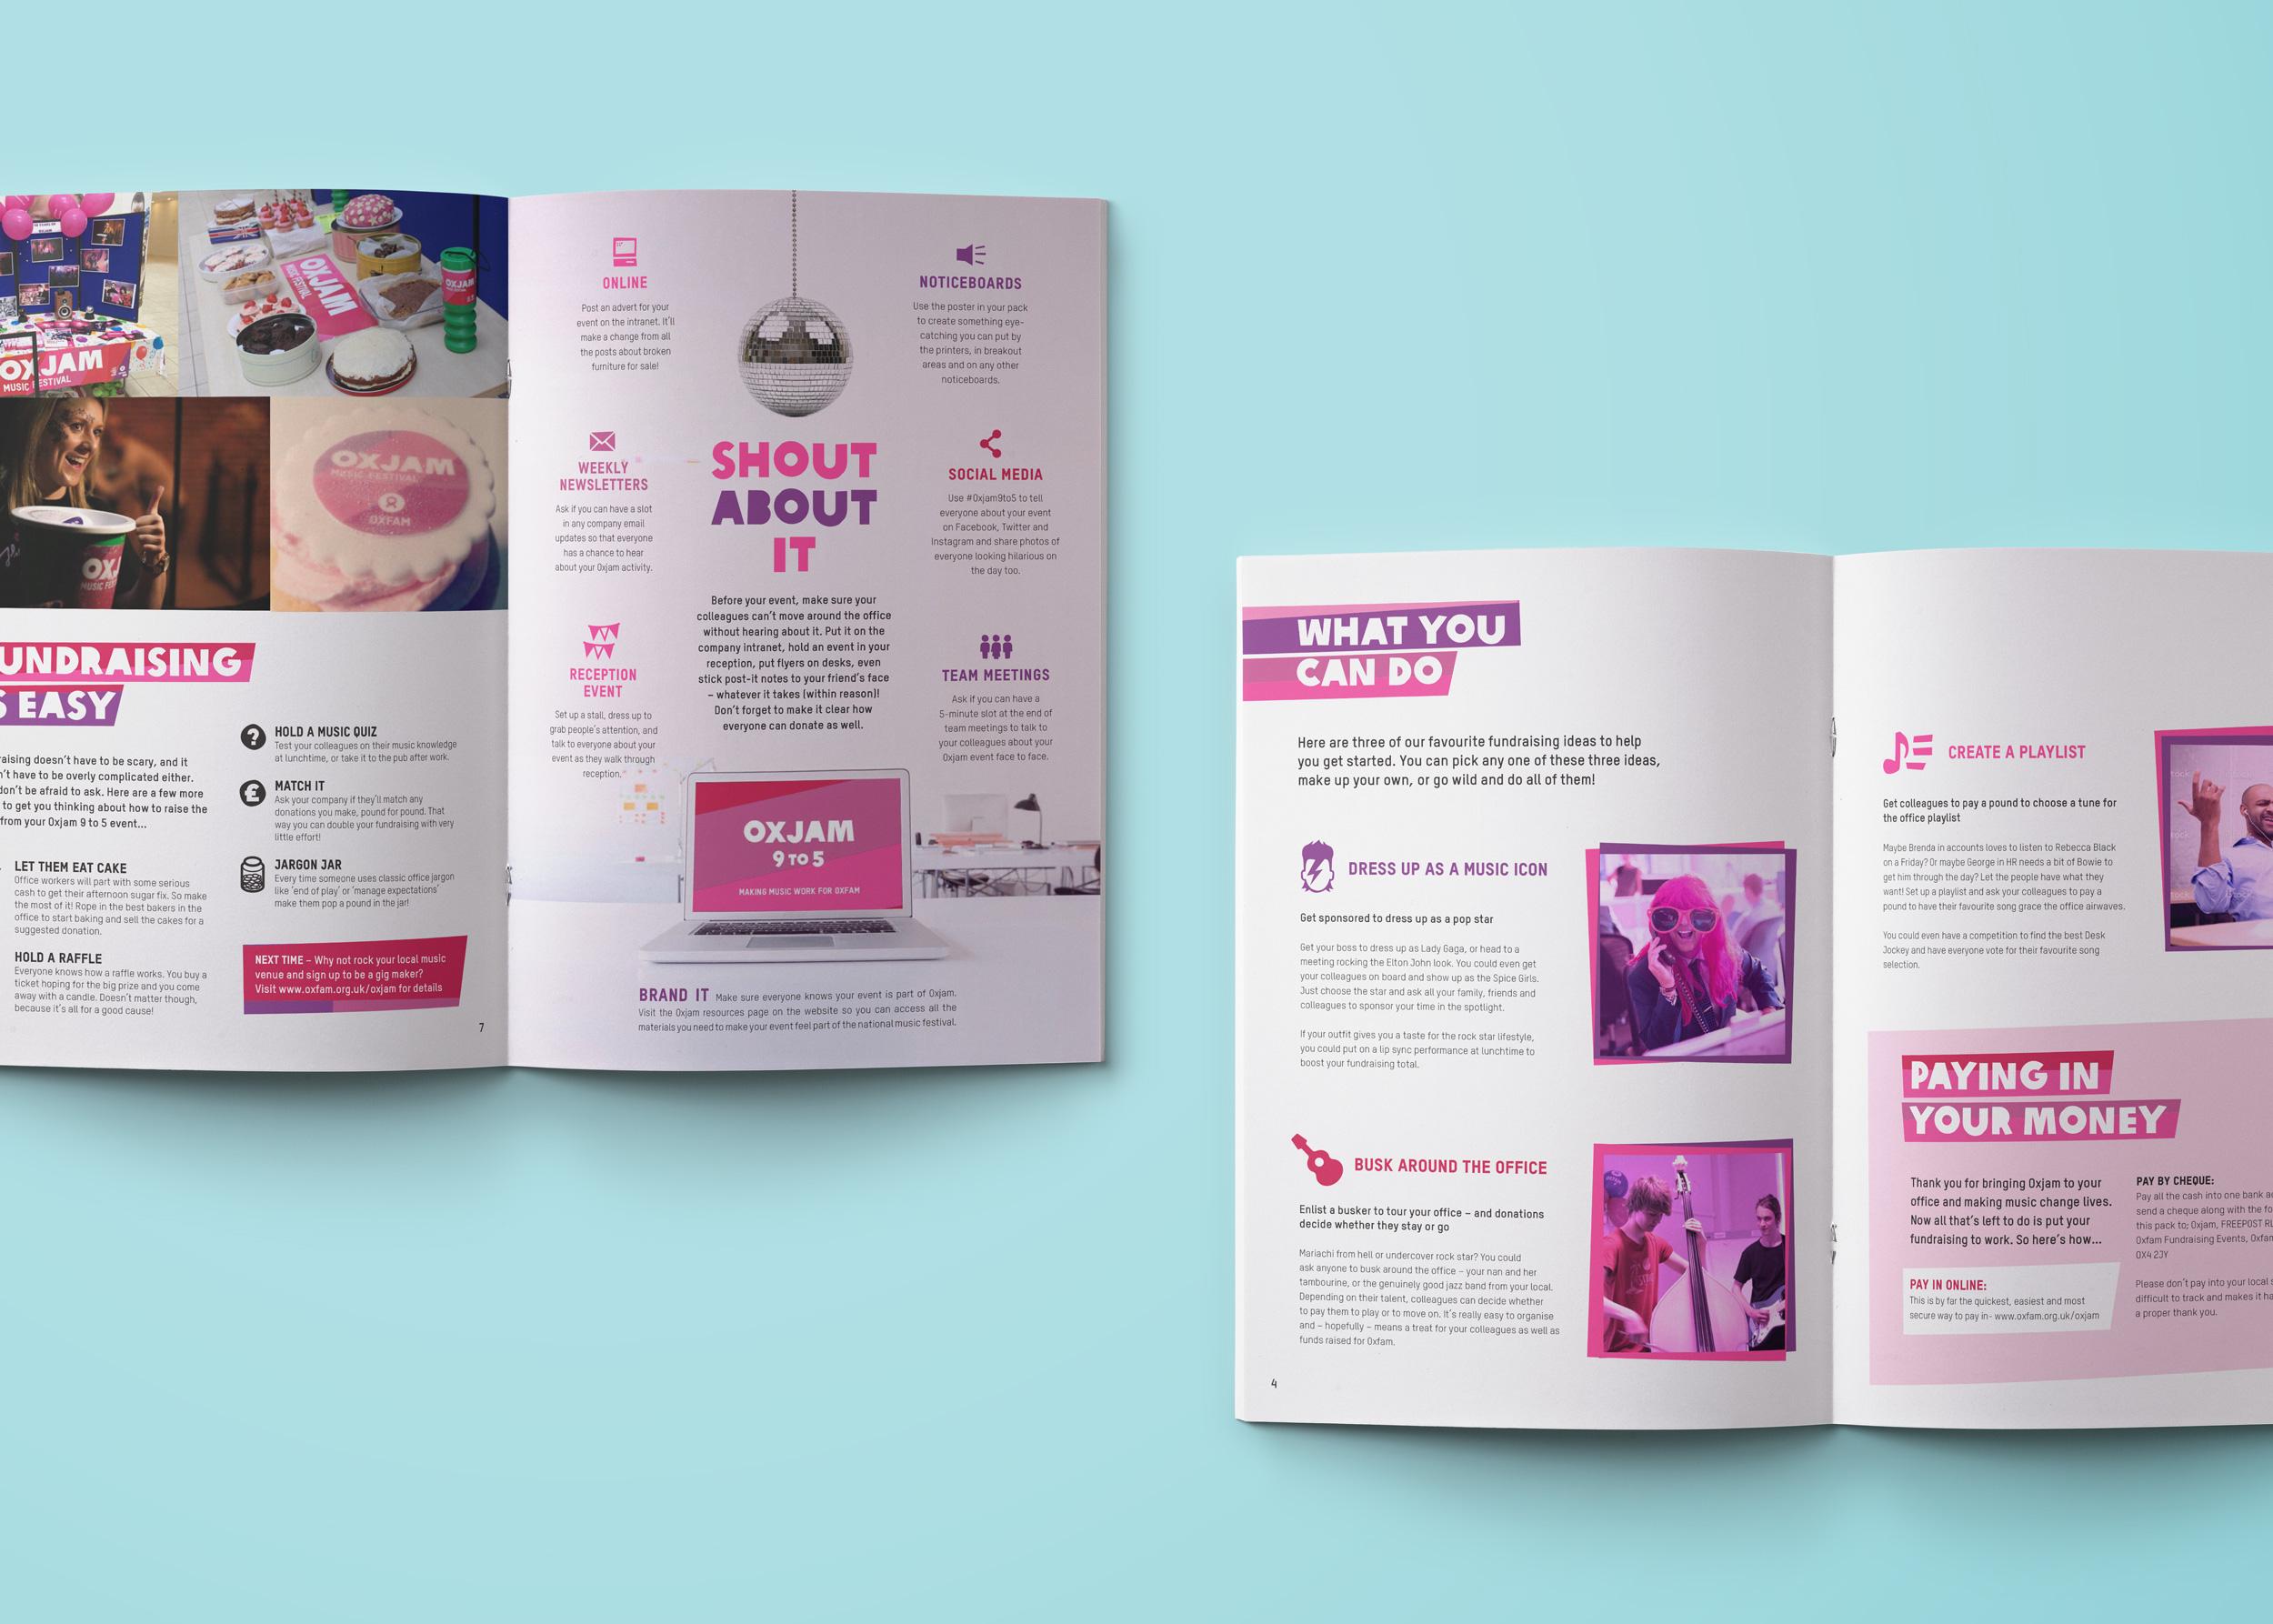 oxjam-brochure-mock-pg-3.jpg